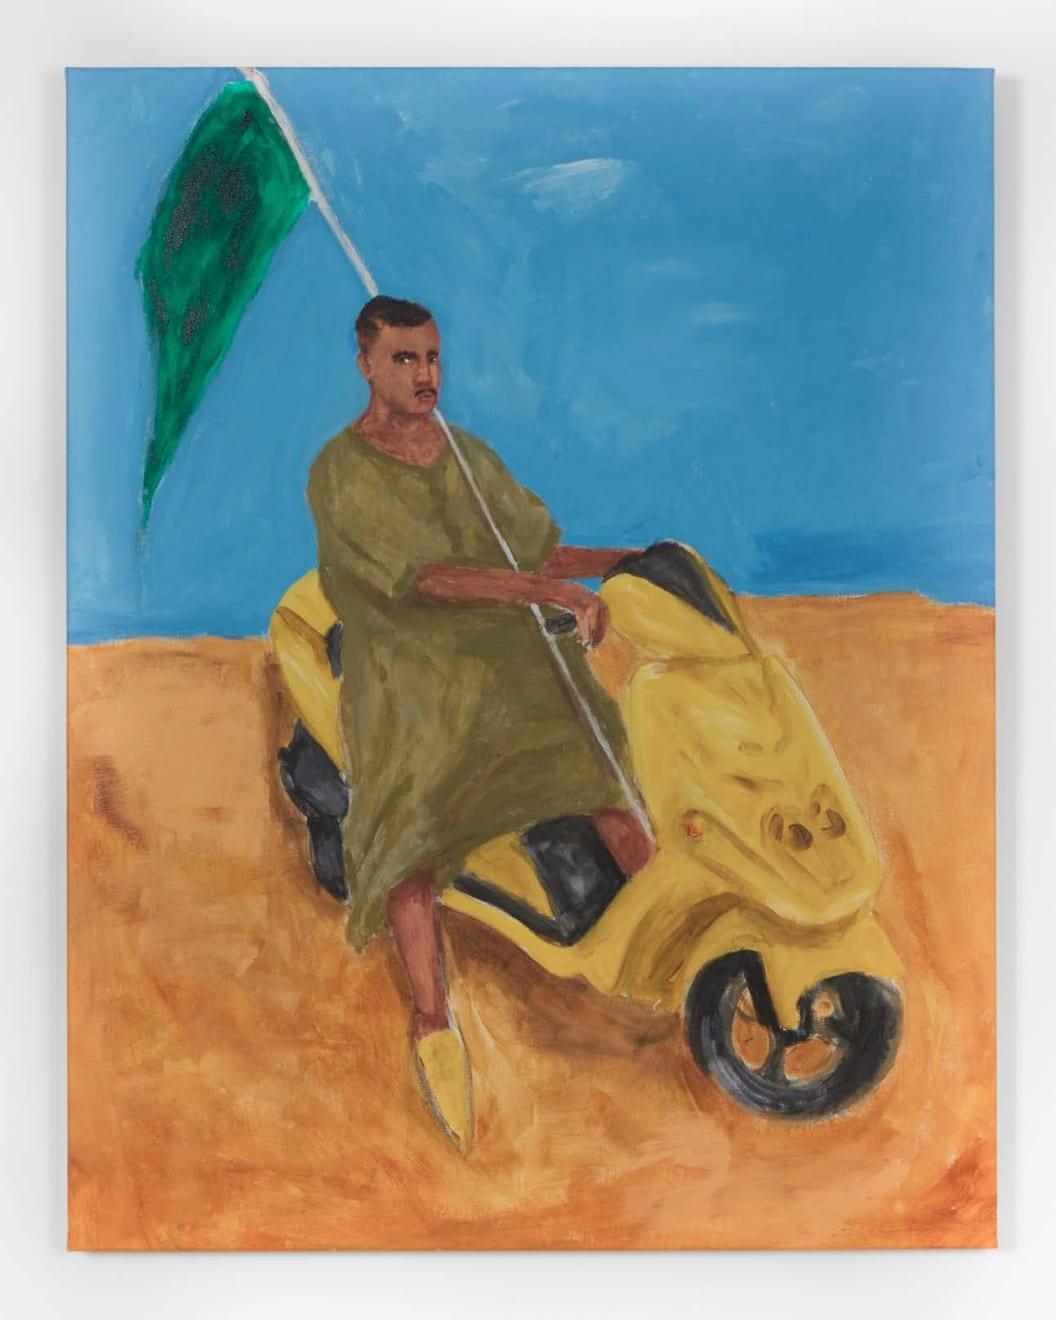 Anuar Khalifi, UNTITLED (SCOOTER), 2020, Acrylic on canvas, 98 x 77cm EUR 5,000 (Excluding VAT)